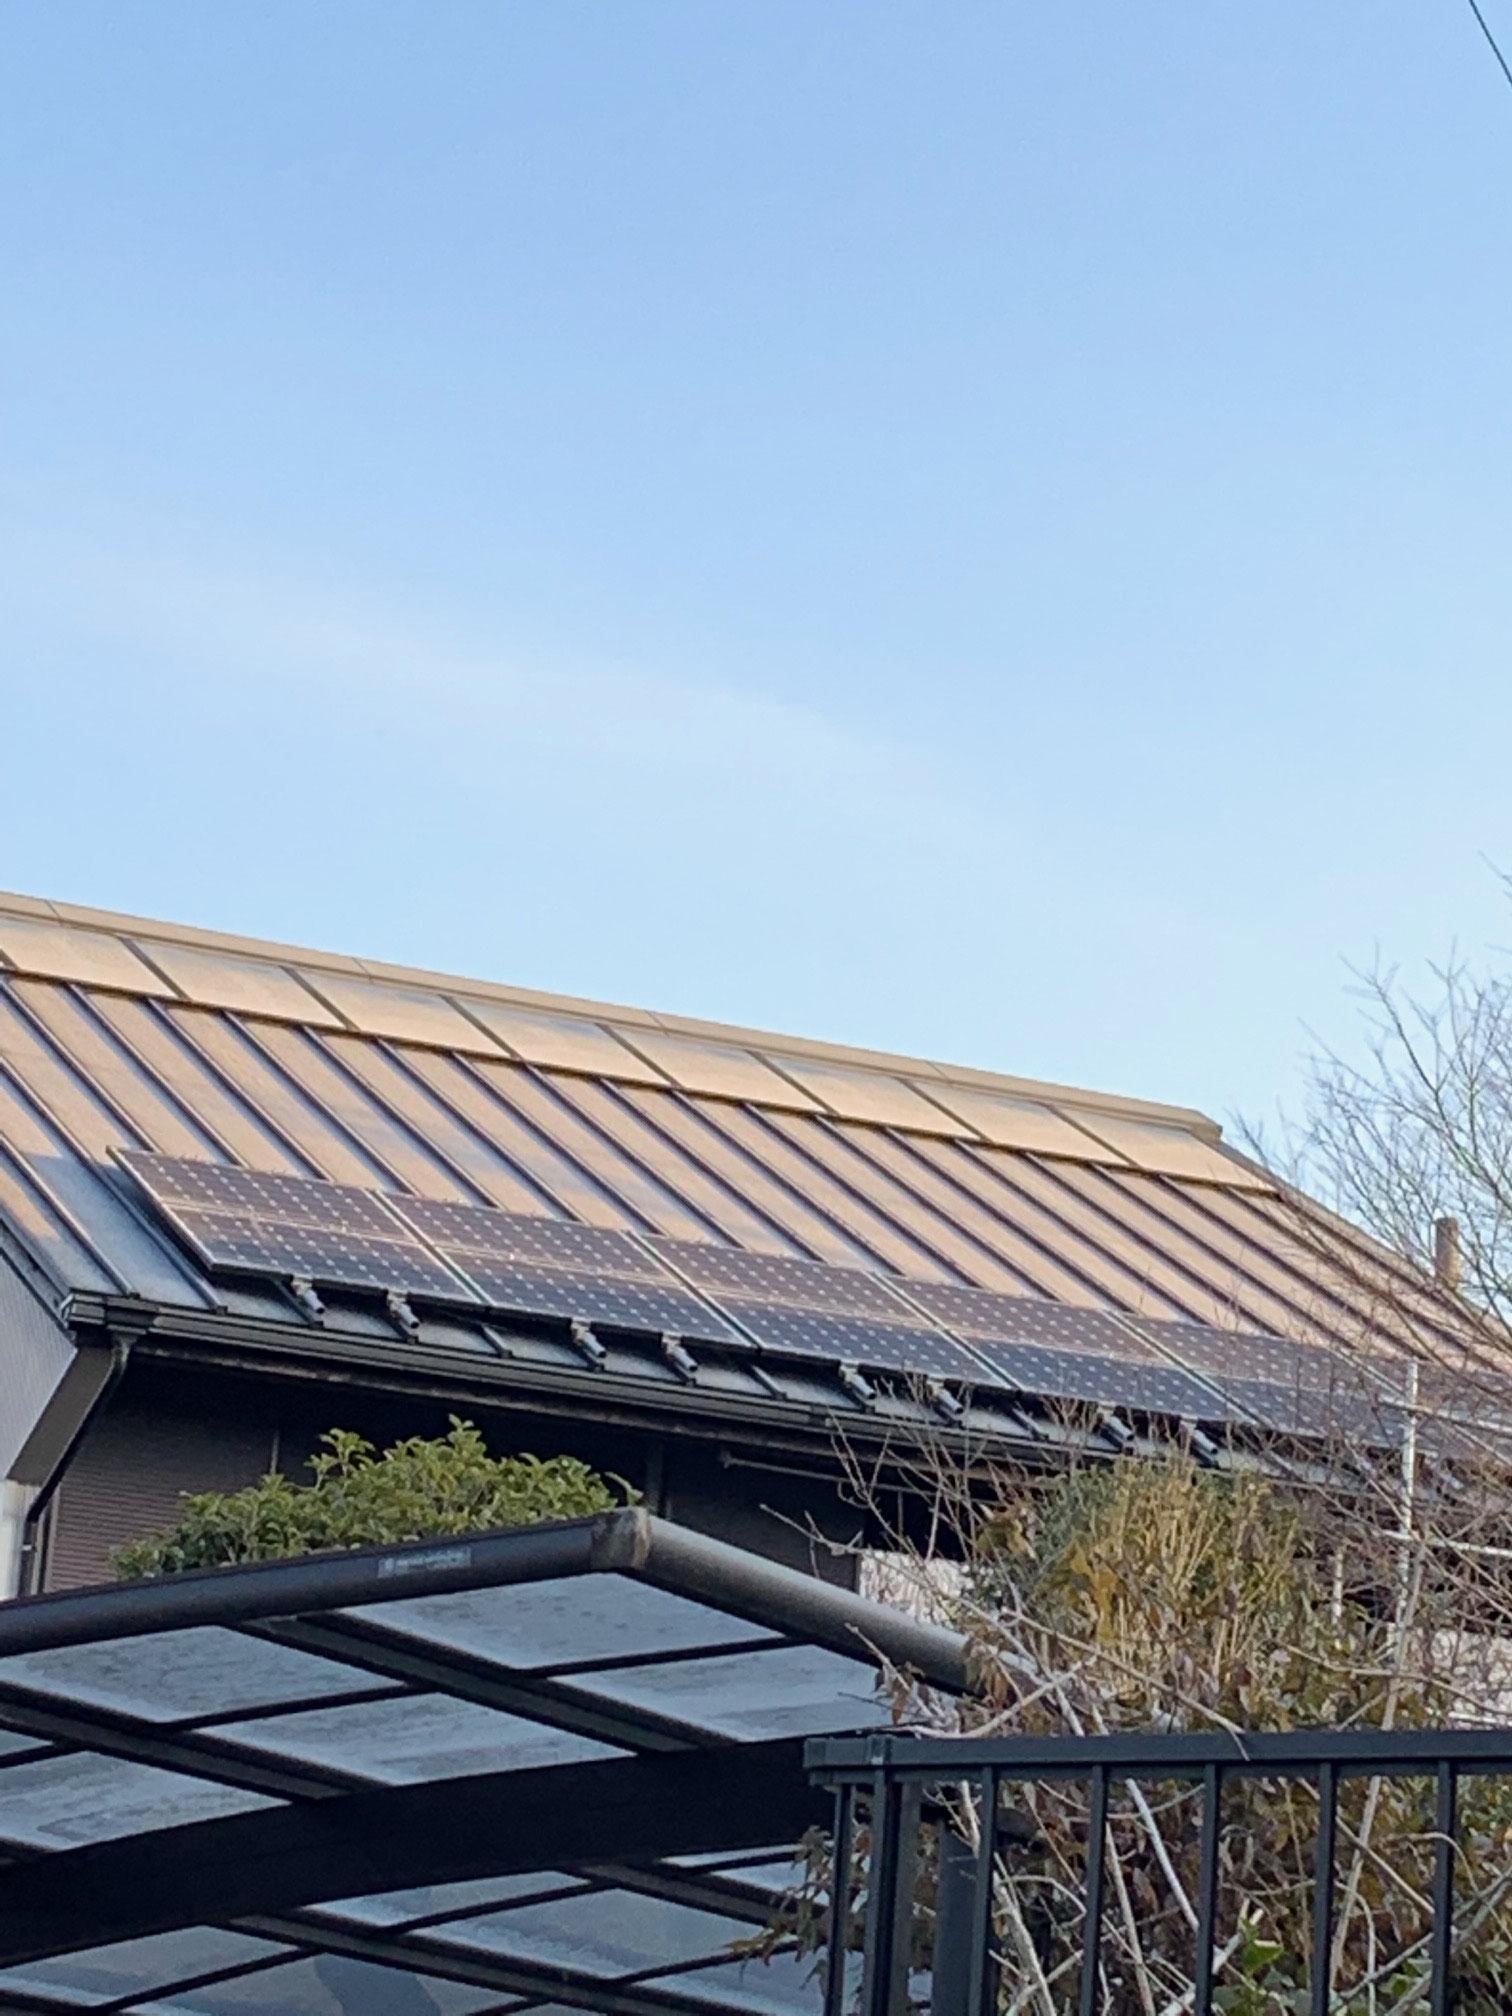 OMソーラー+太陽光発電搭載の屋根 蓄電池の設置などサポートします